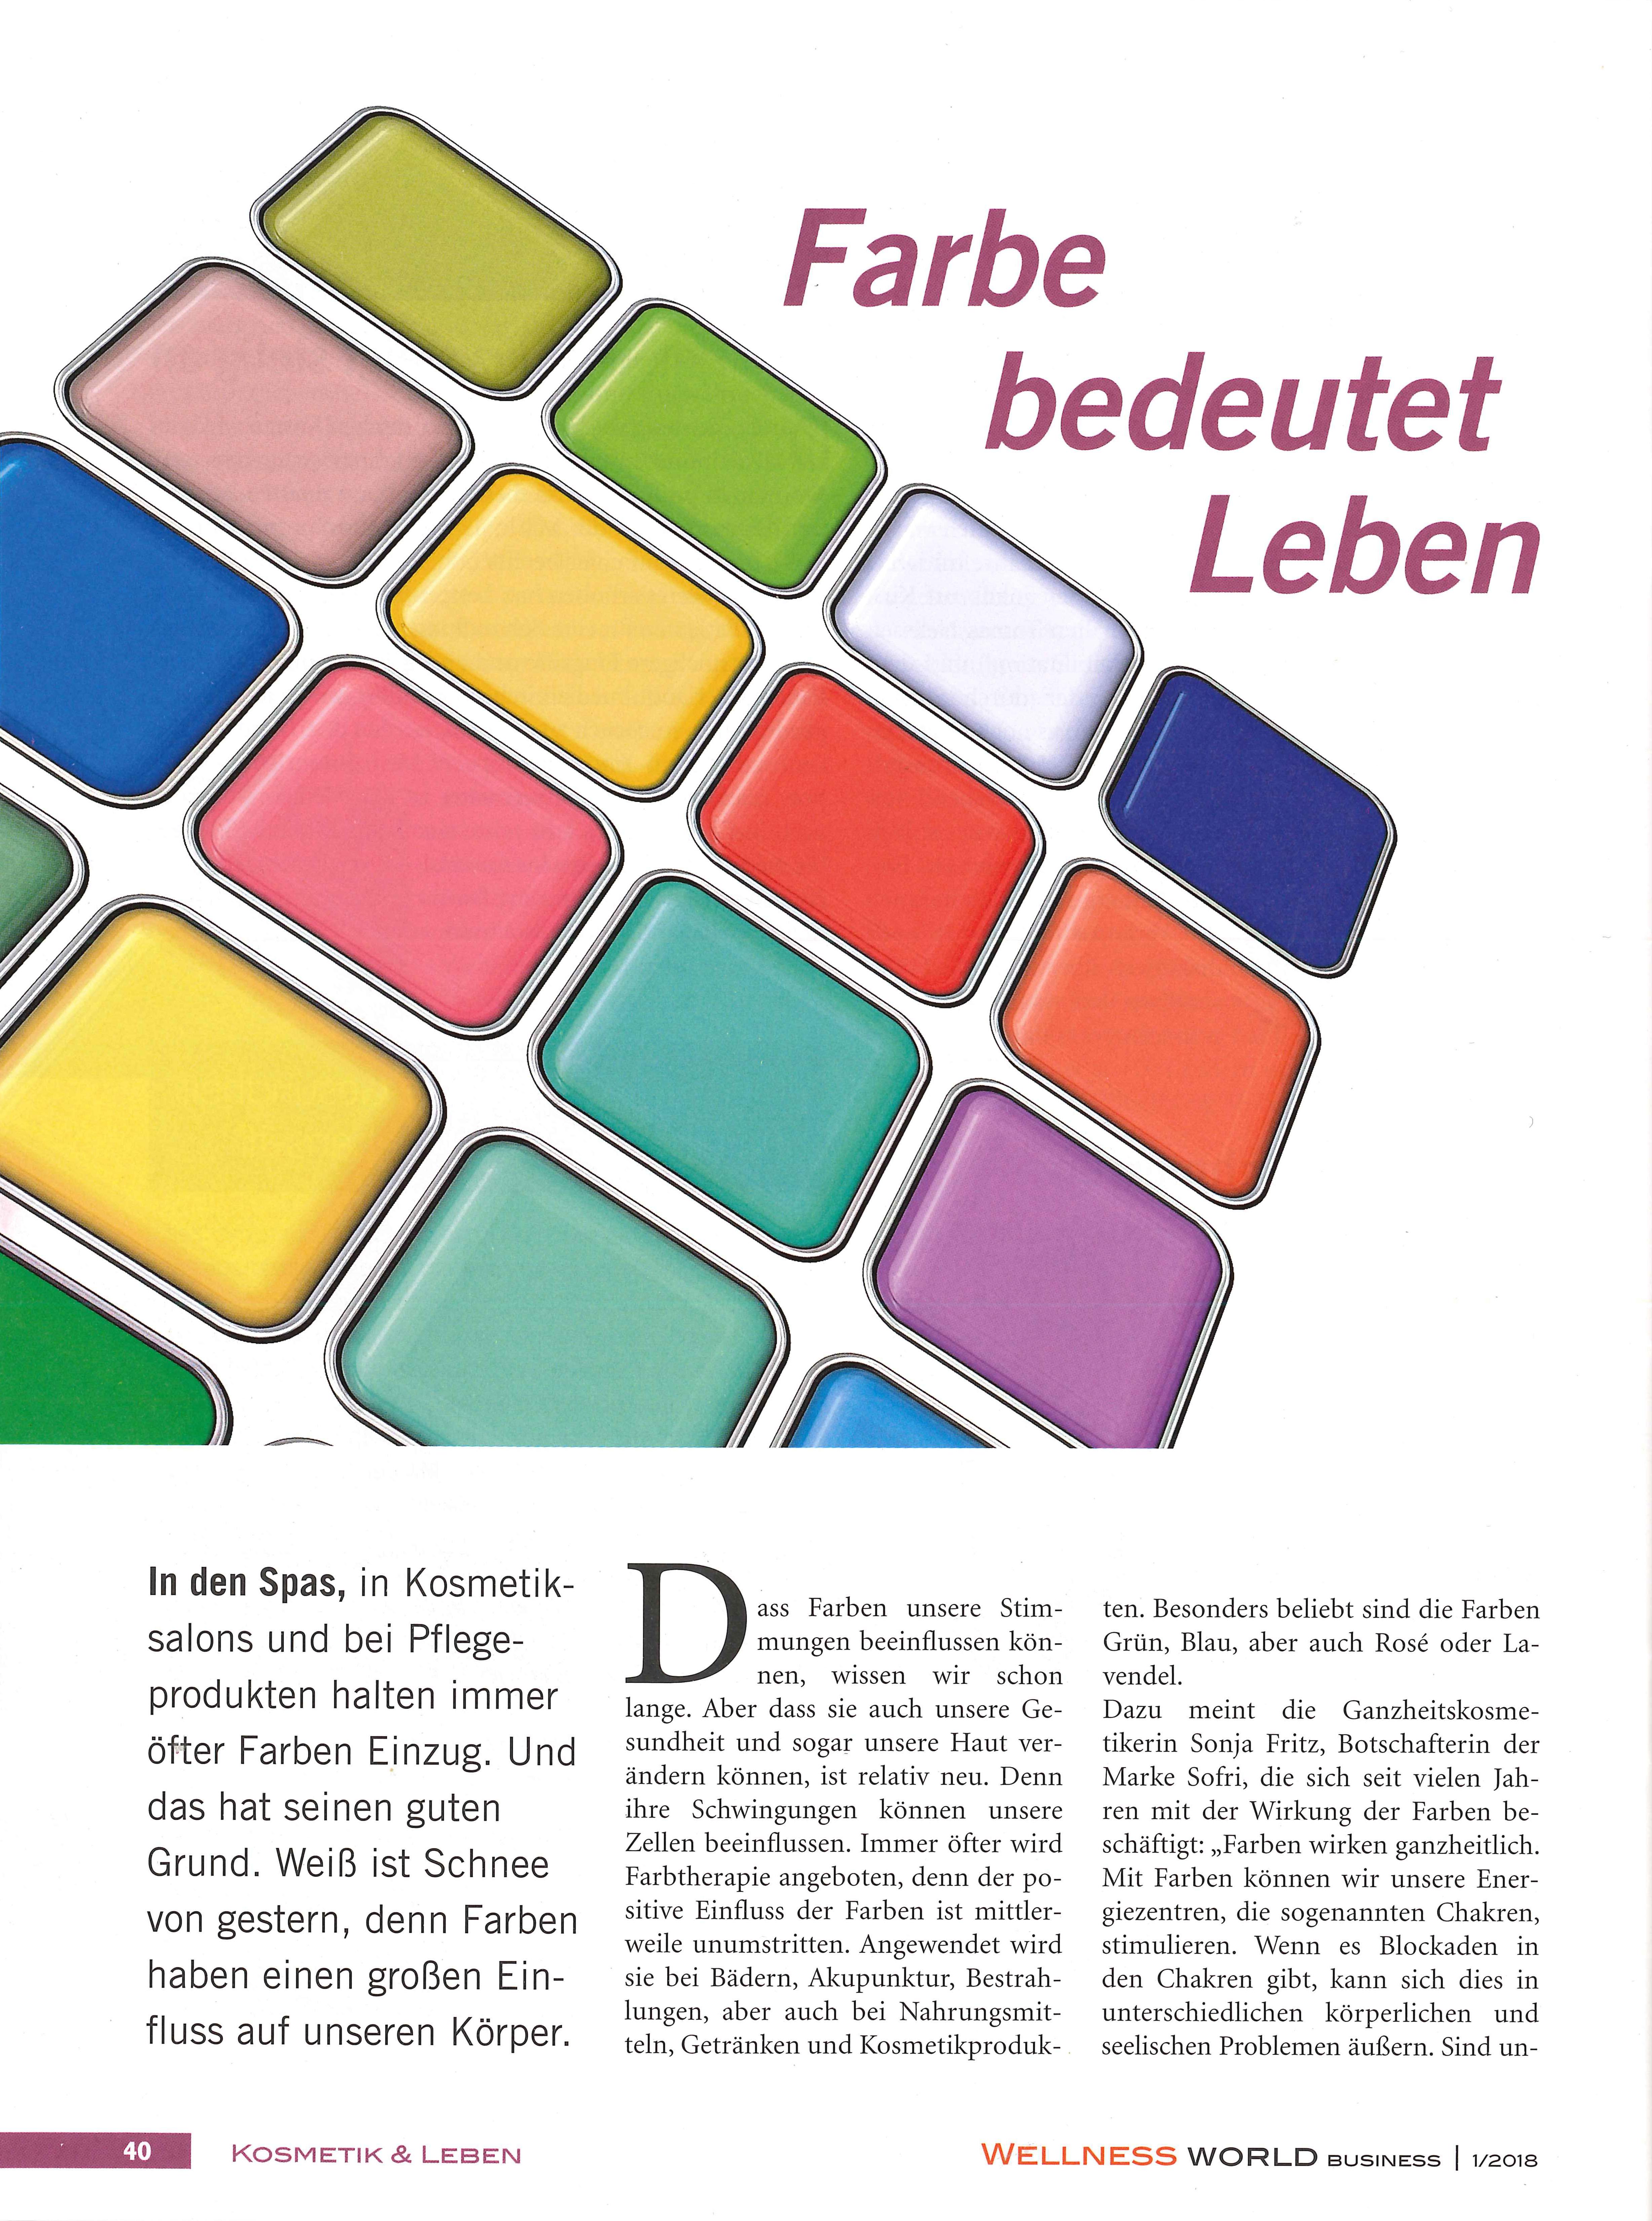 Farbe bedeutet Leben, Wellness World im Jänner 2018